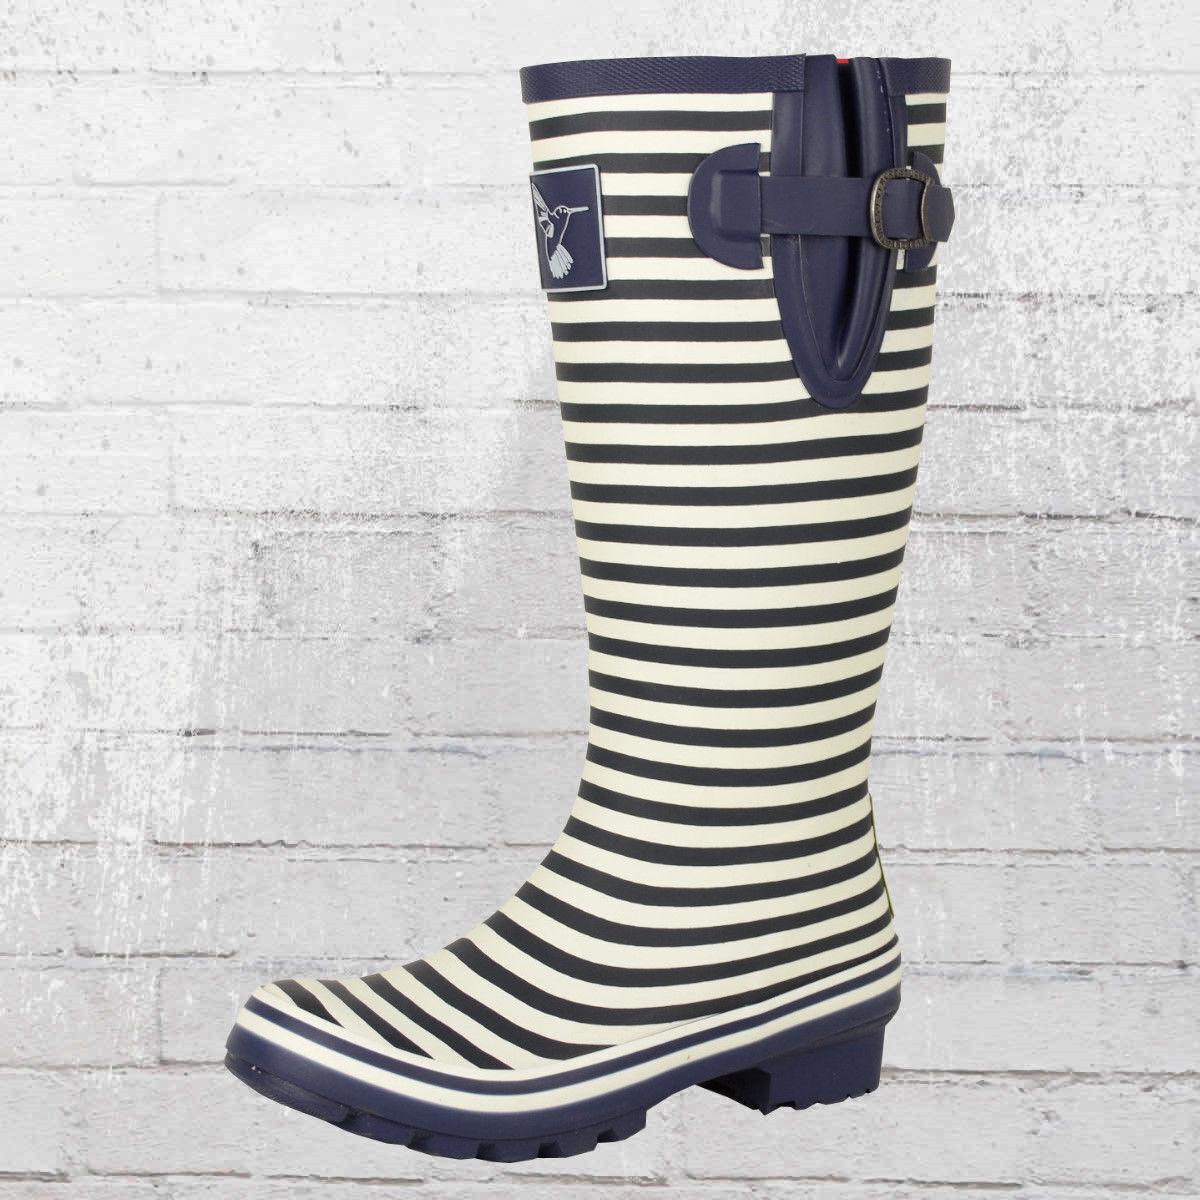 Evercreatures señora botas de goma Bristol Tall marítimo wellington Boots wellies